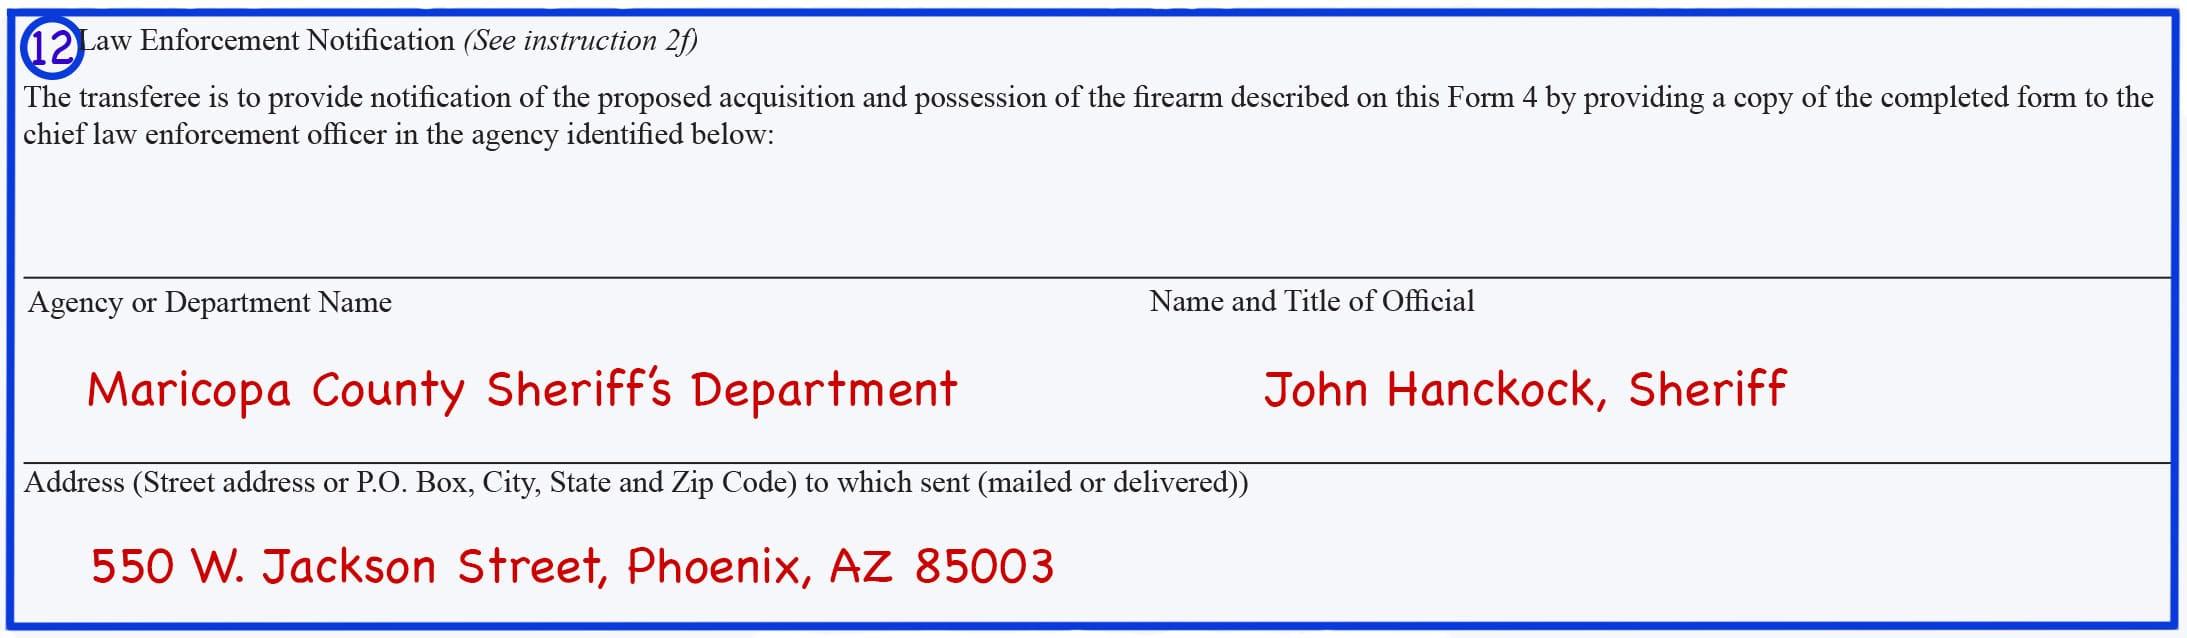 Form 4 Box 12